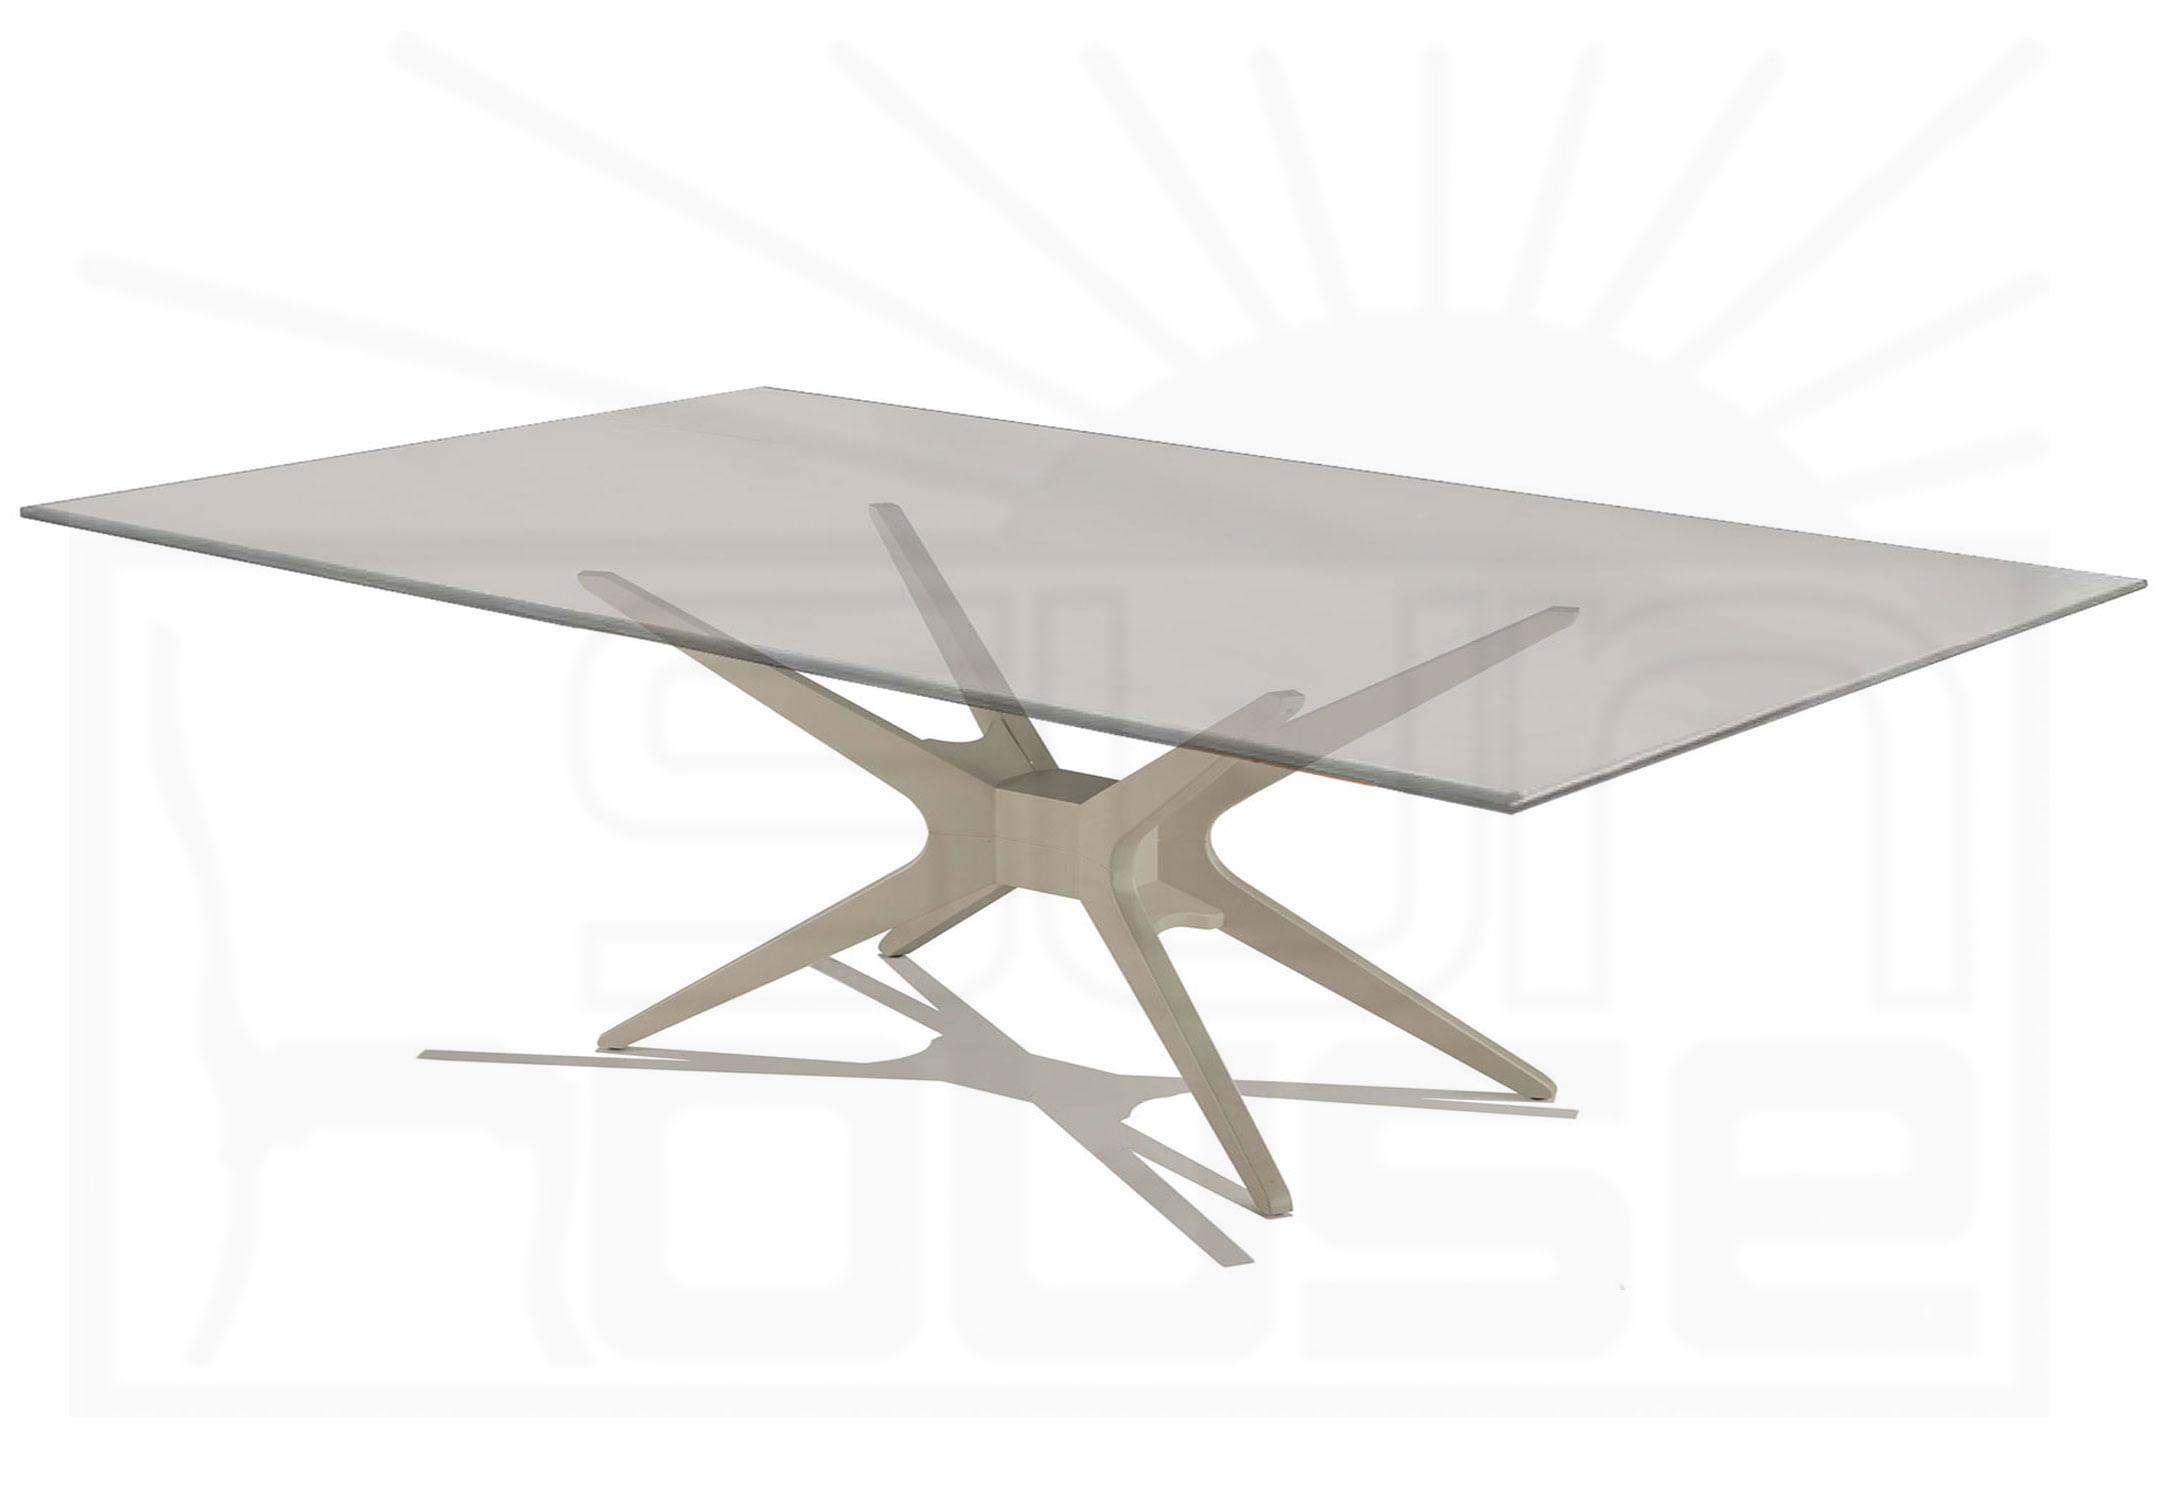 Mesa de Jantar XS com Tampo de Vidro Retangular Base Fendi Fosco 2,00 MT (LARG) - 57131